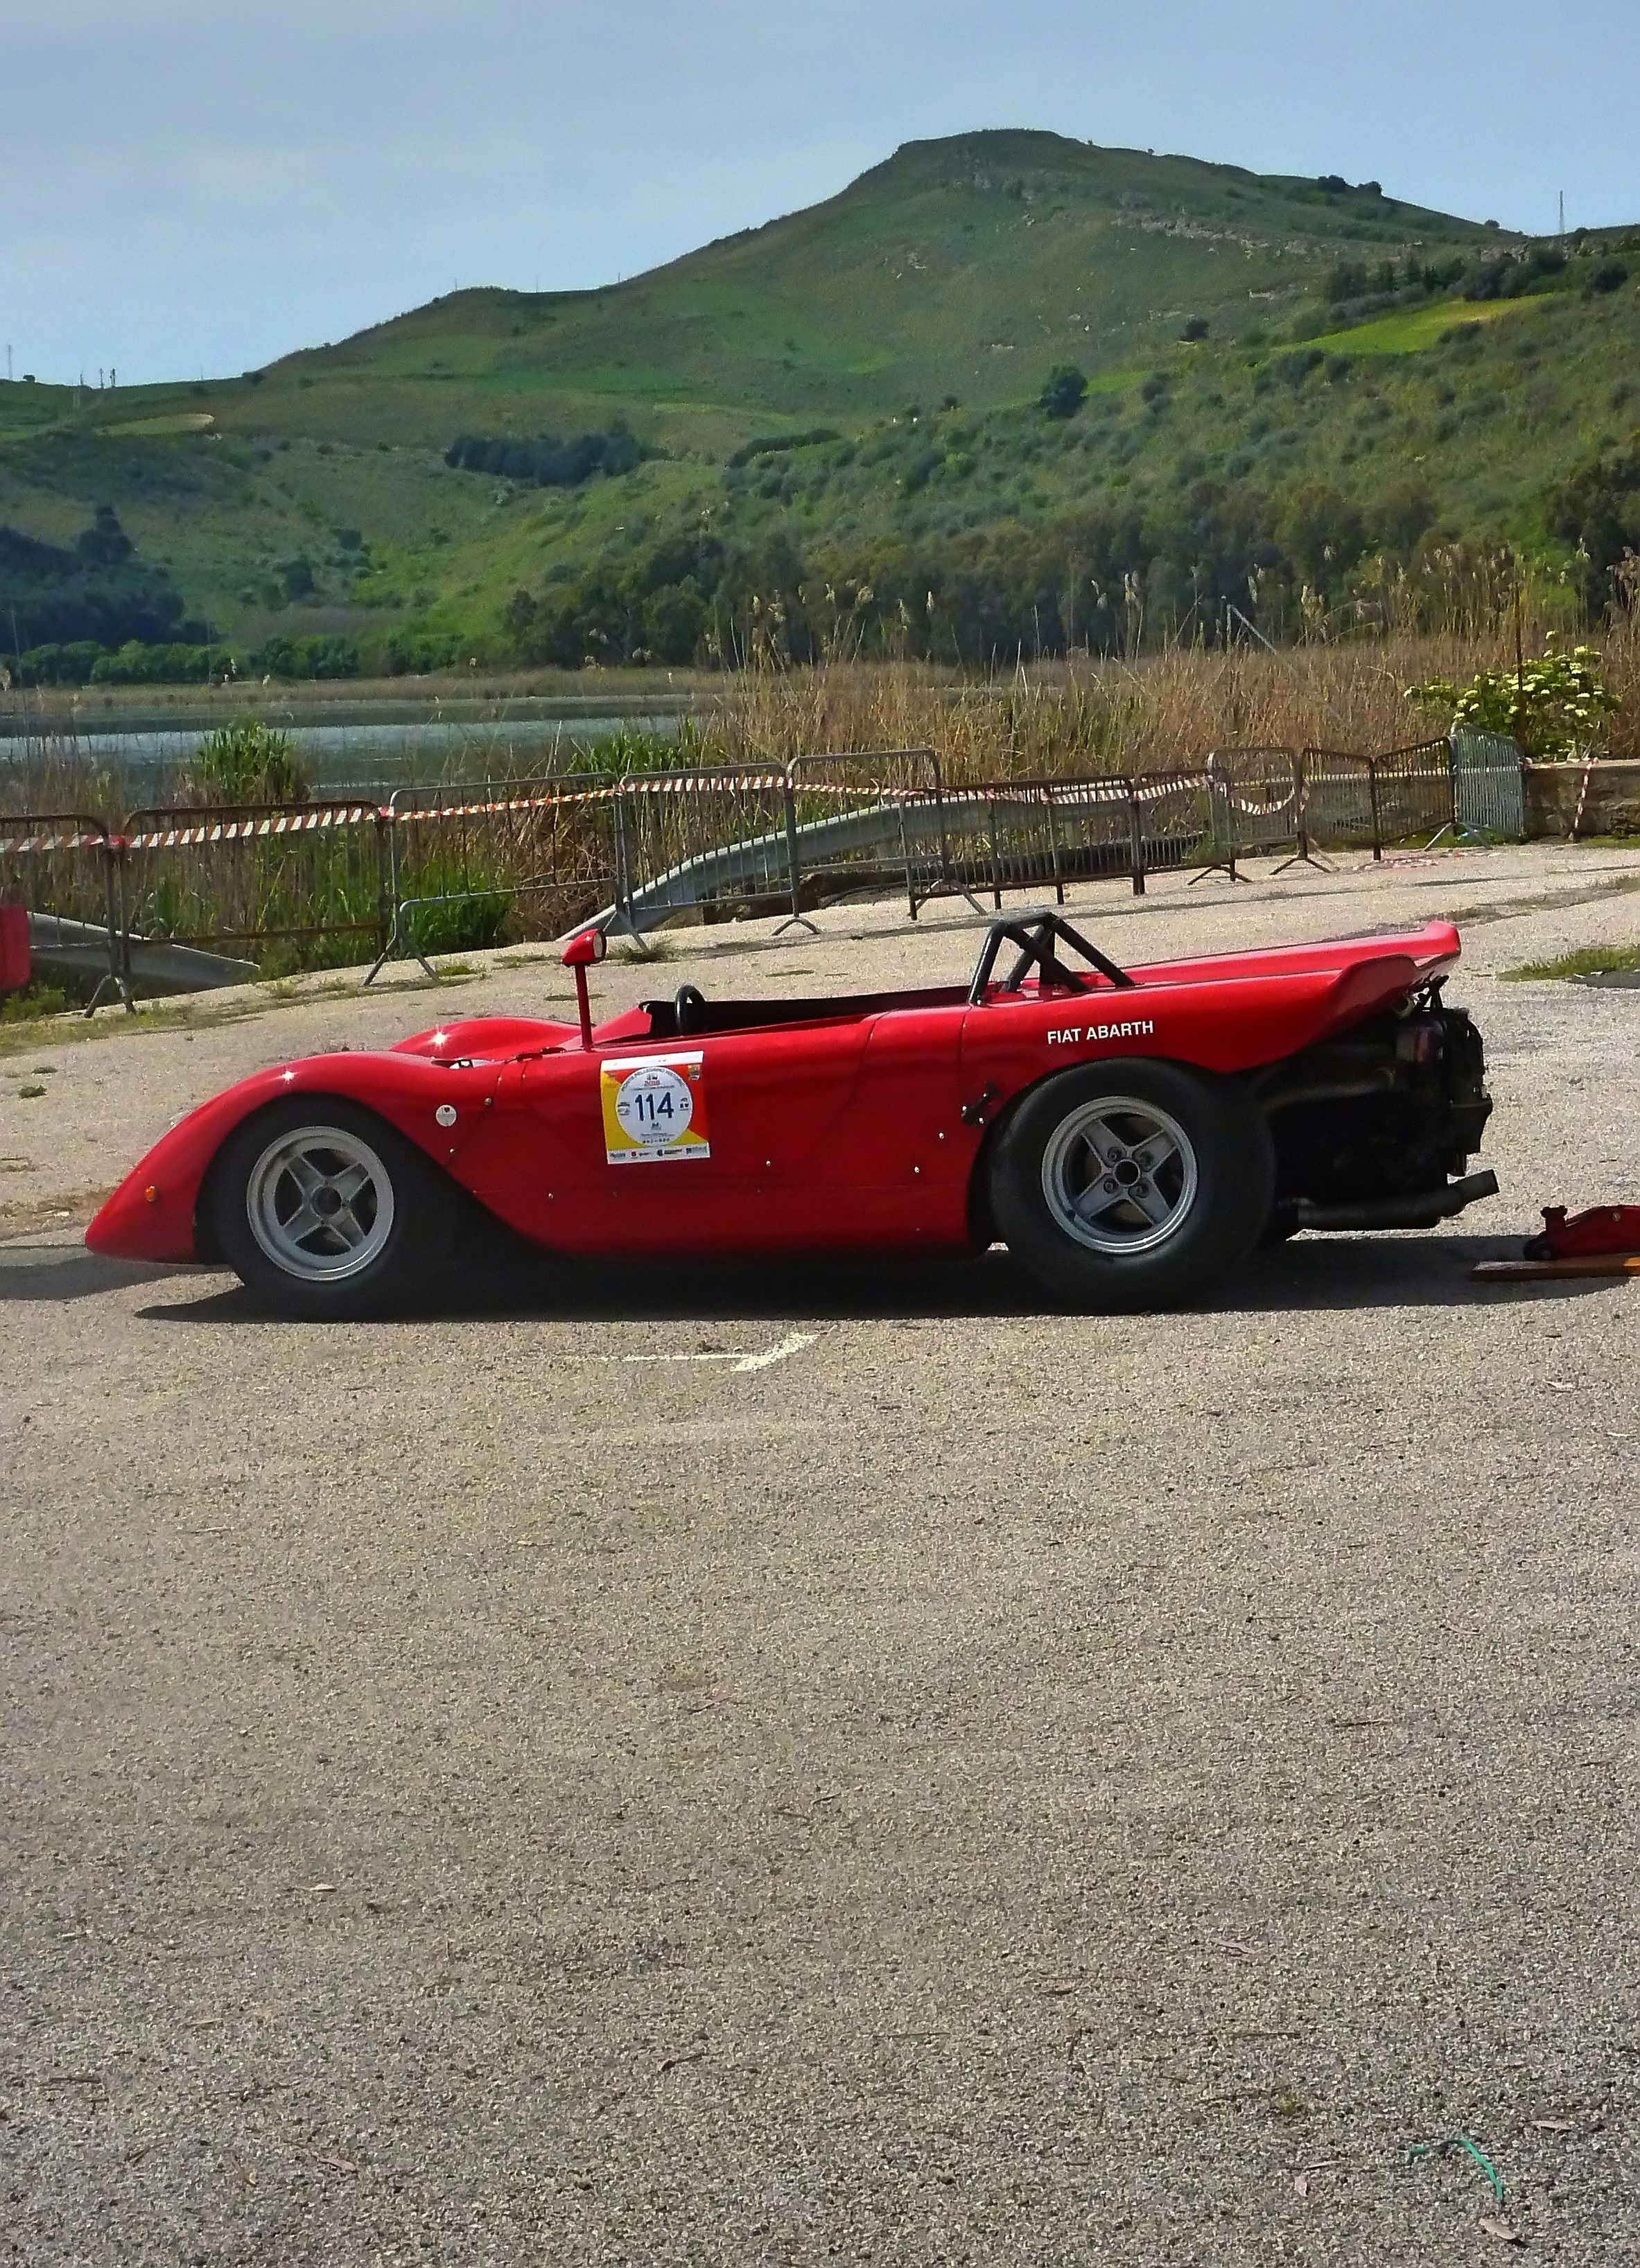 1971 Abarth 1300 SE 018 Biposto Cuneo (18)